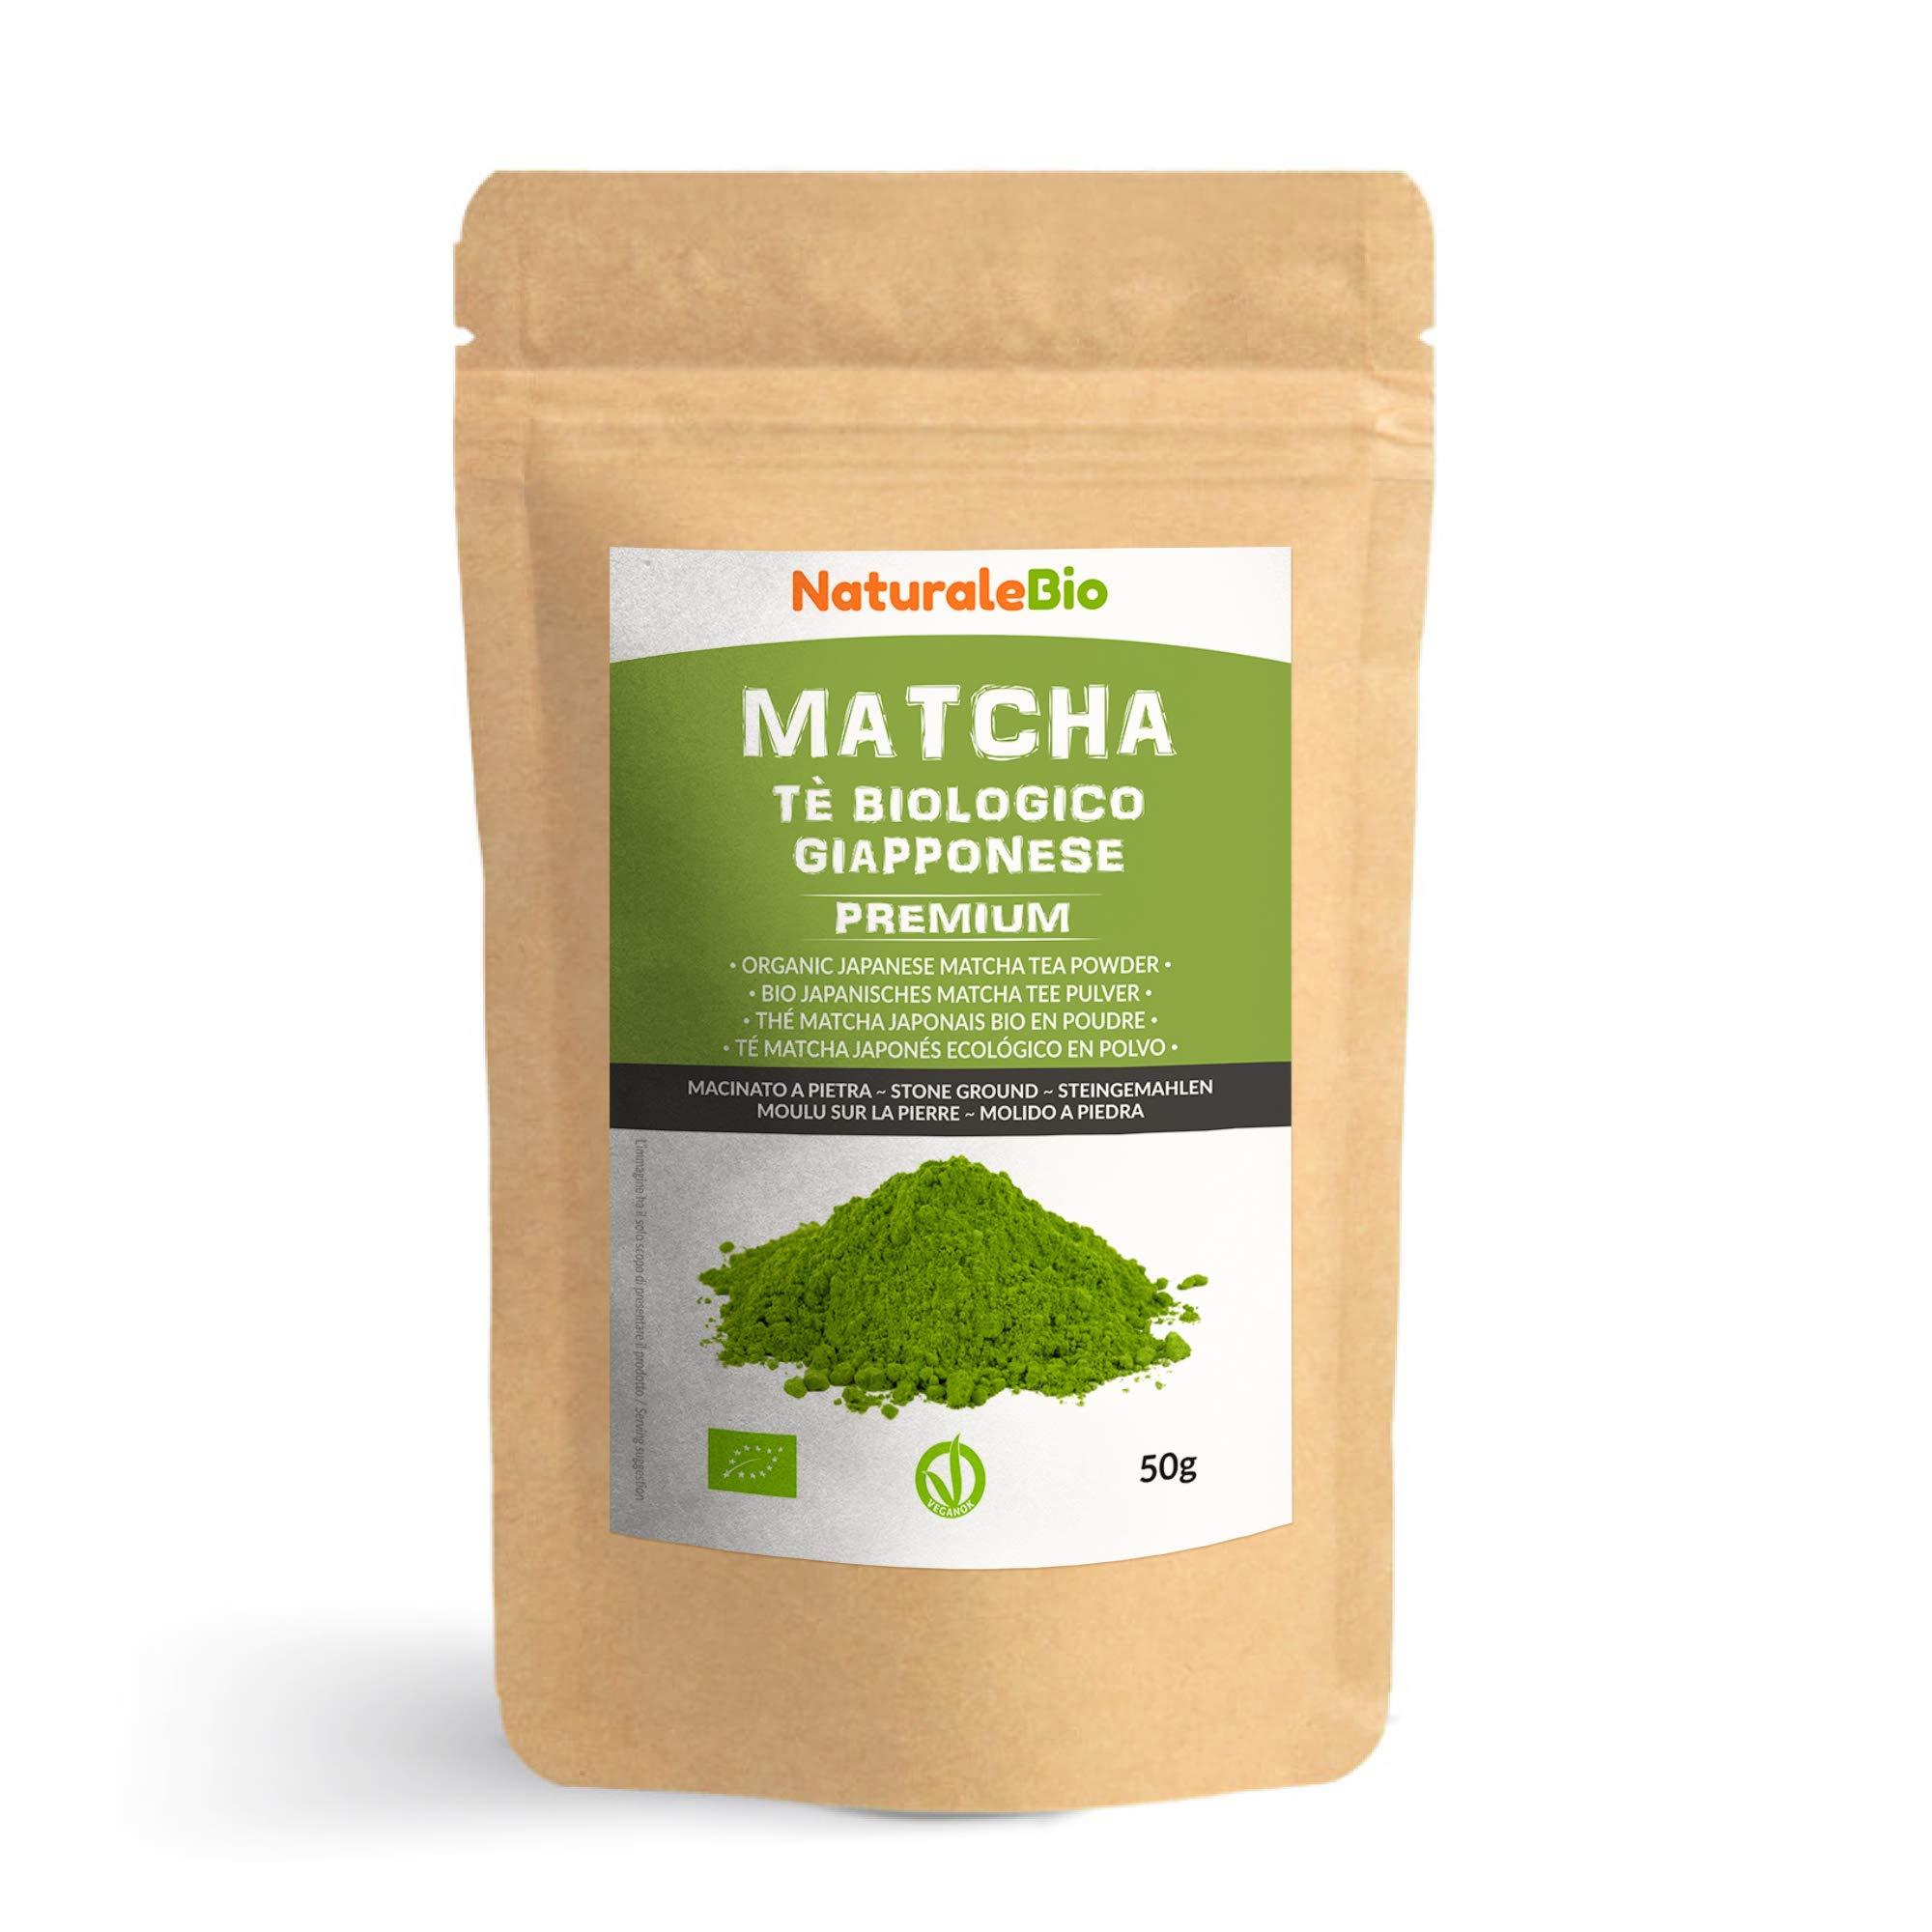 Japanese Organic Matcha Green Tea Powder [ Premium Grade ] 50g. Tea Produced in Japan, Uji, Kyoto. Use for Drinking, Cooking, Baking, Smoothie Making and with Milk. Vegan & Vegetarian Friendly